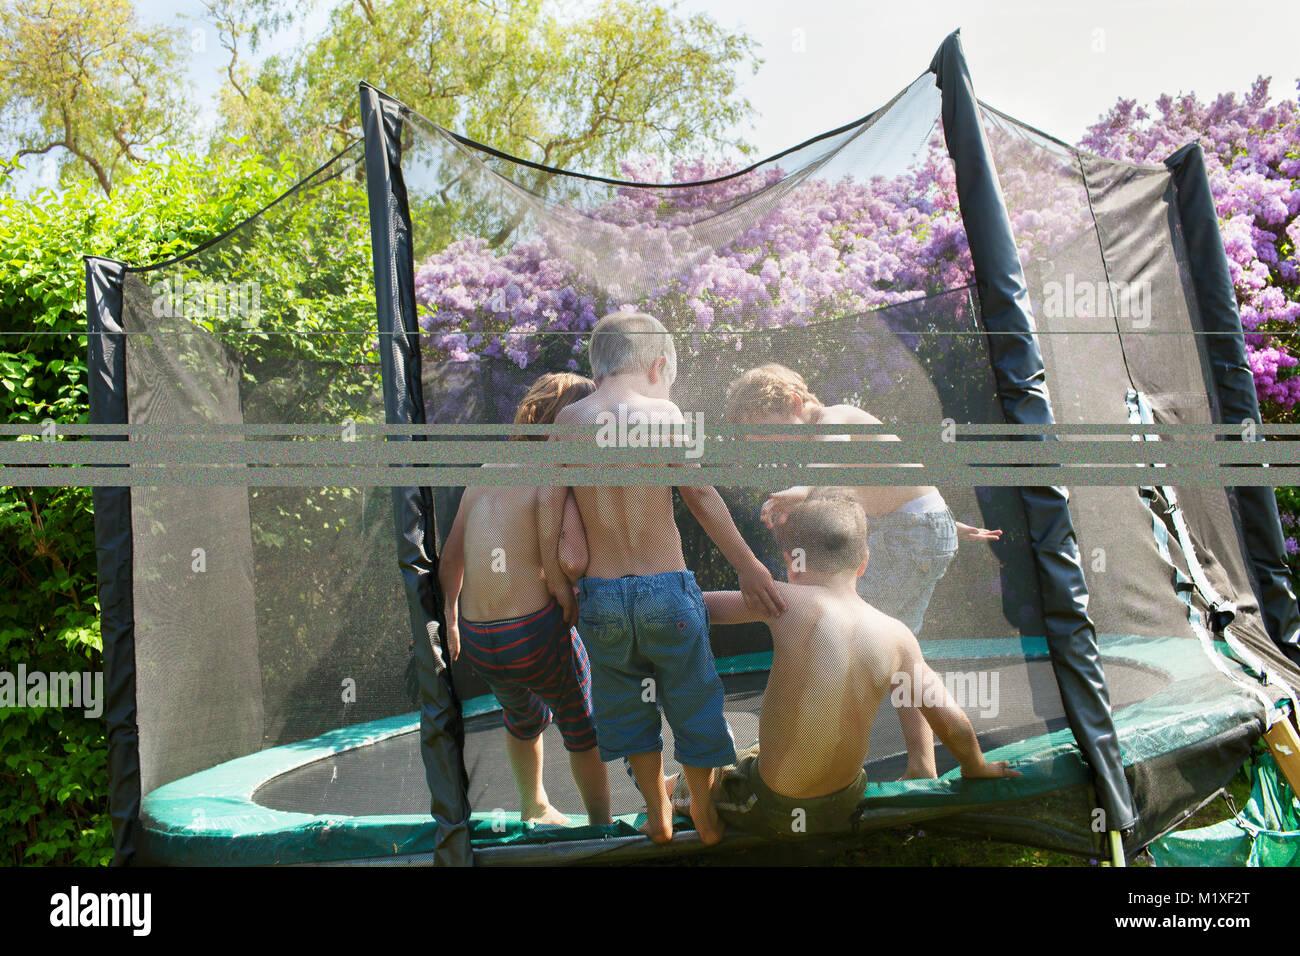 Boys on trampoline - Stock Image